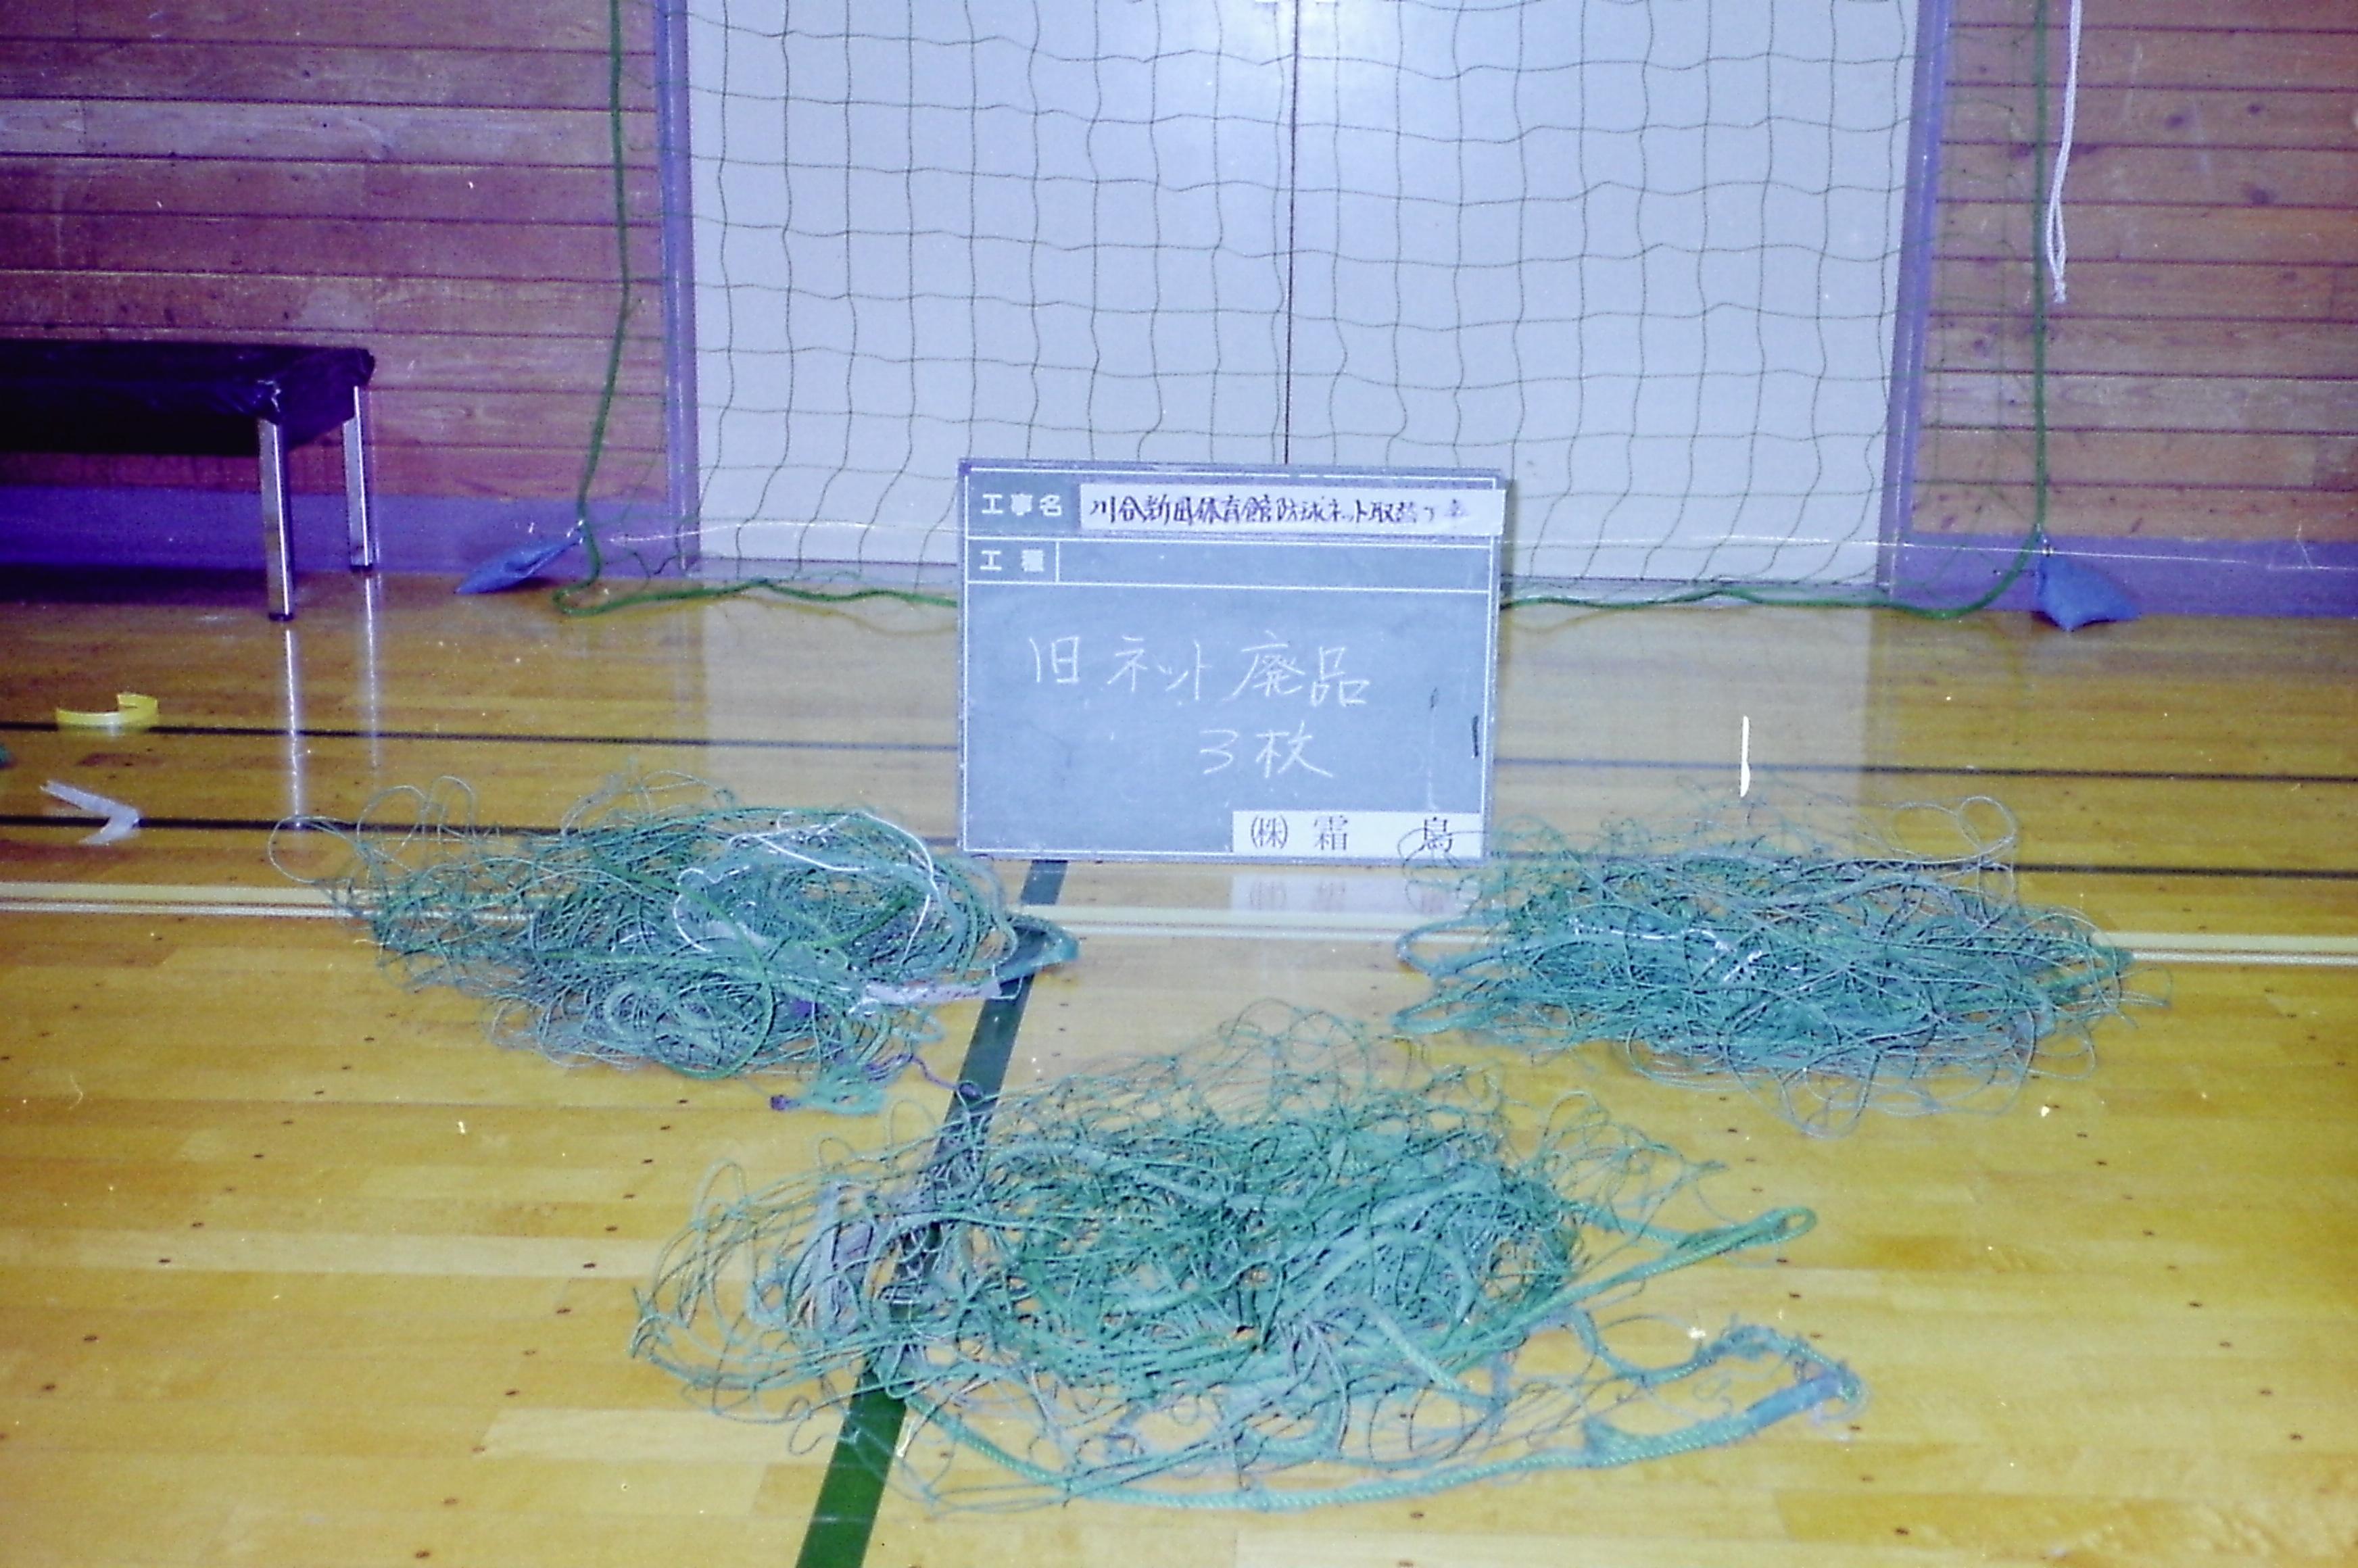 体育館ドア・壁保護用防球ネット交換